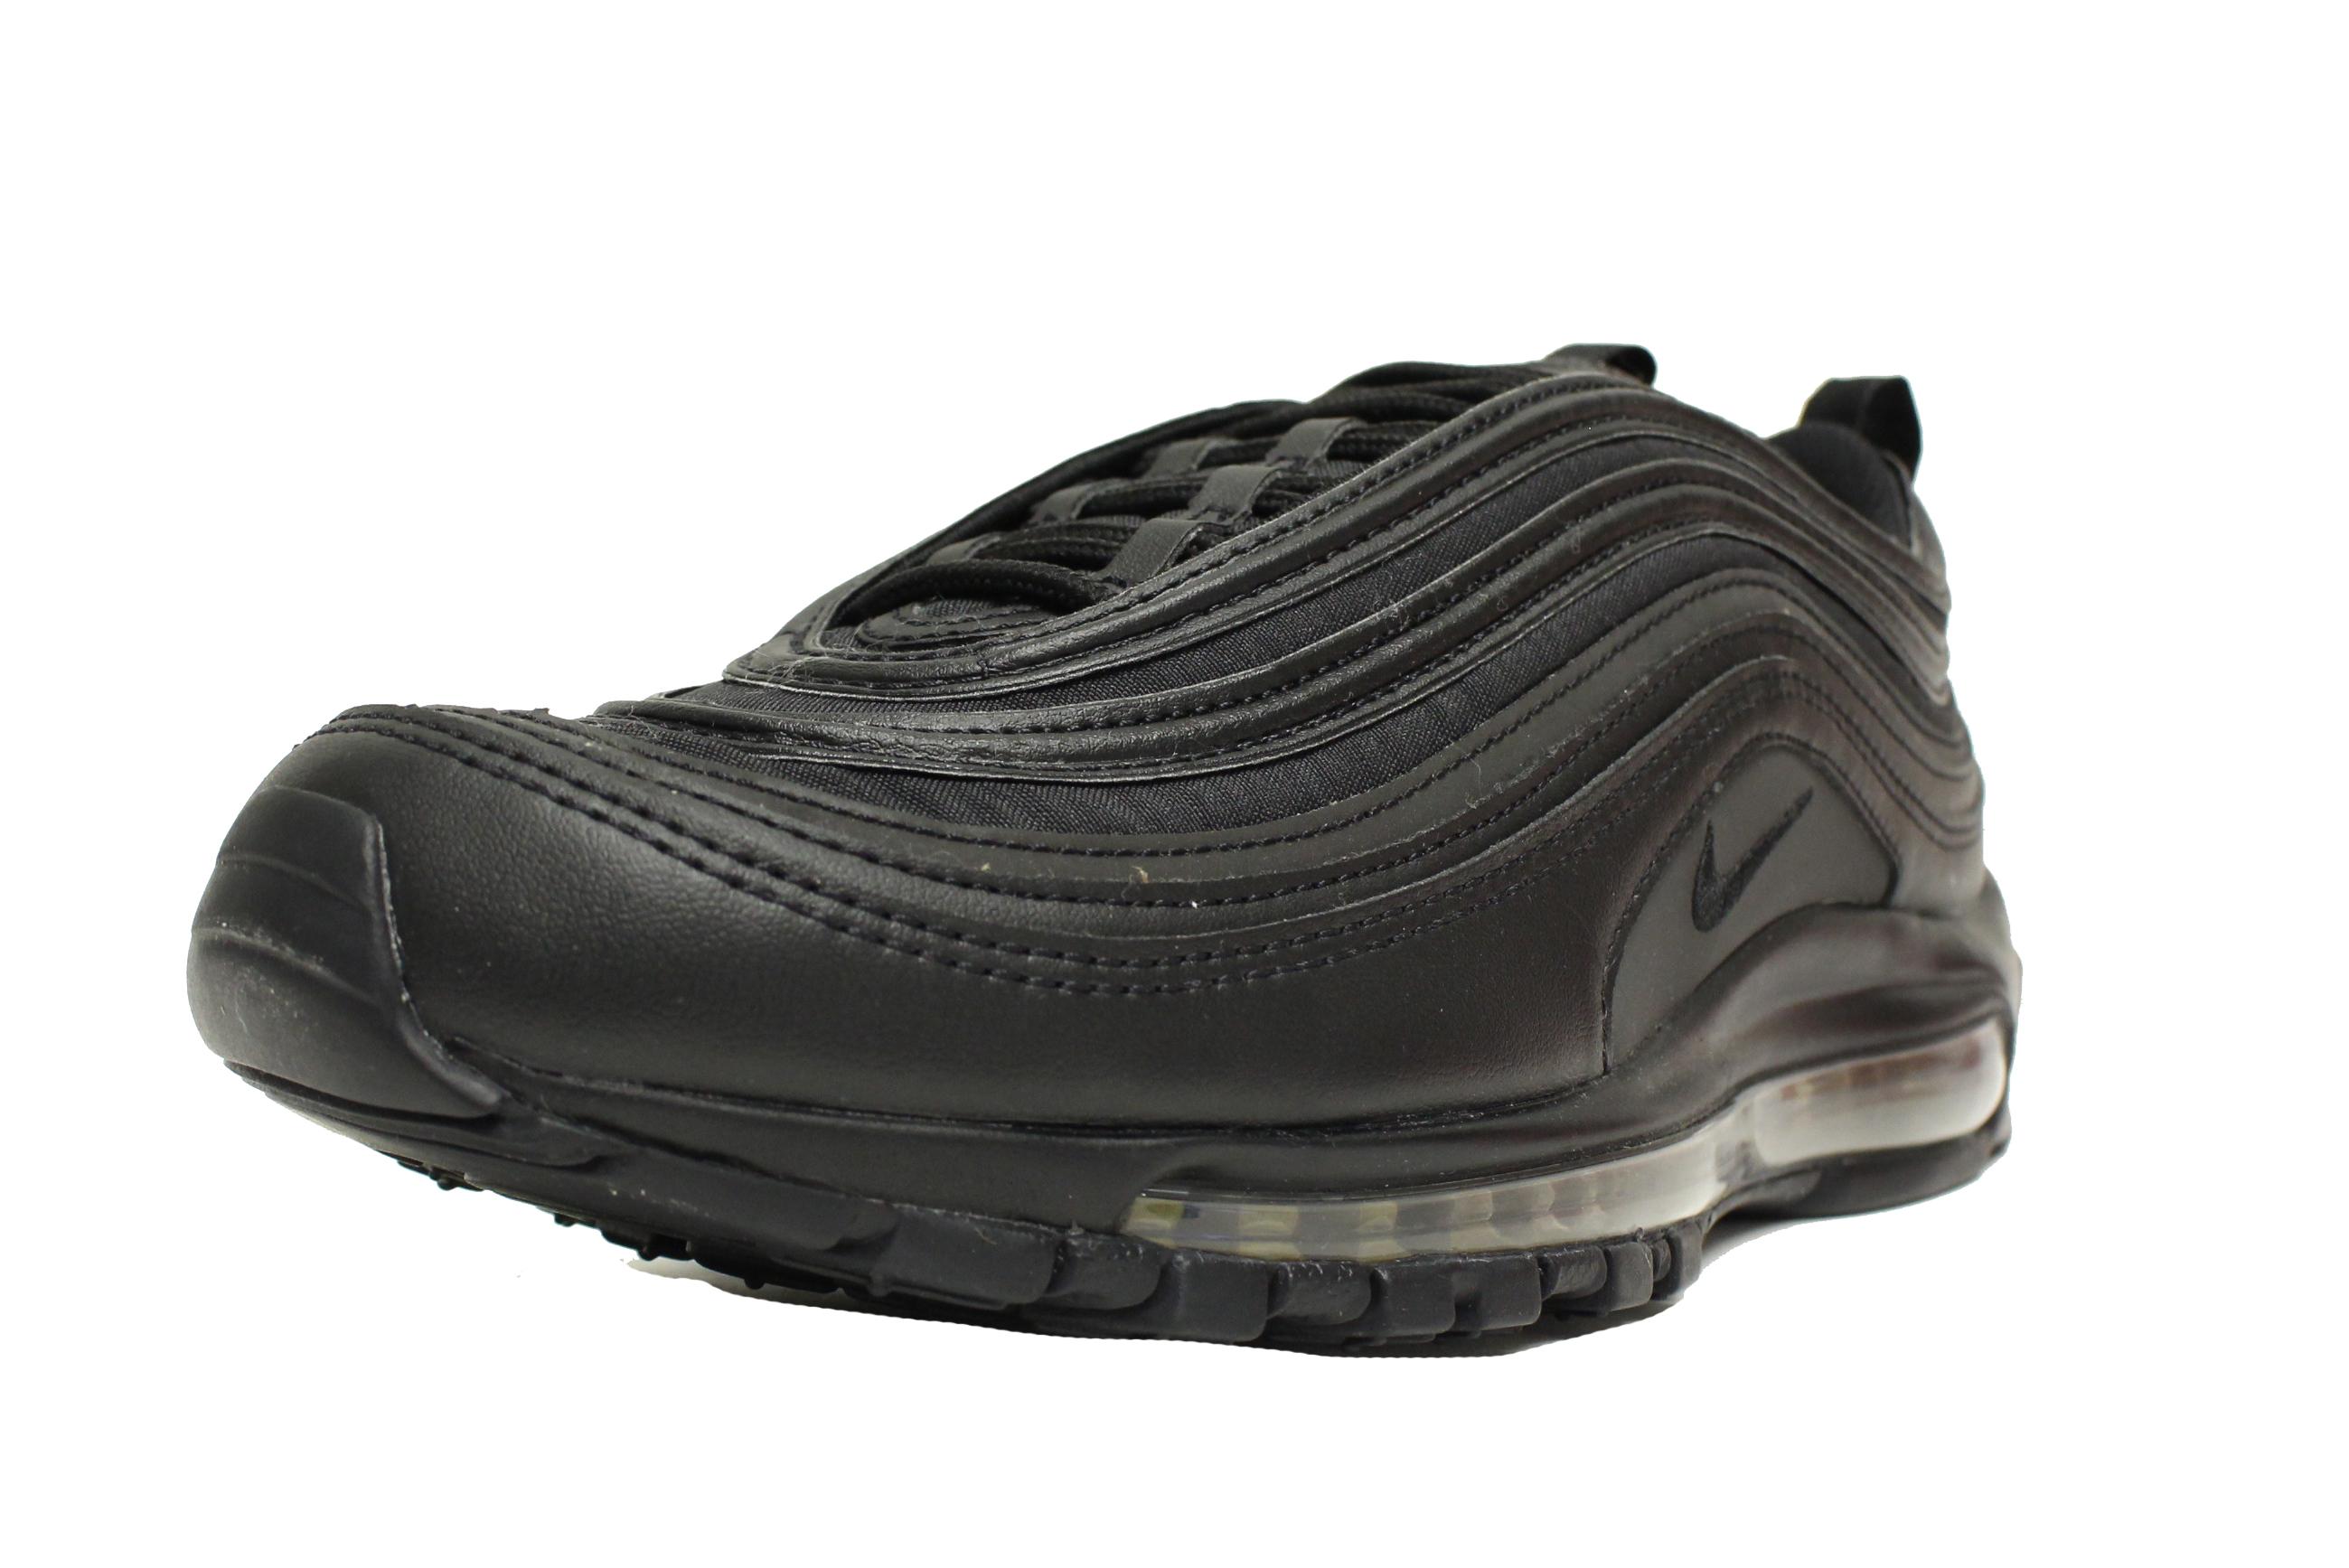 the latest 39b4a 4d066 Nike - NIKE AIR MAX 97 PREMIUM SE SZ 11 TRIPLE BLACK REFLECTIVE GOLD AA3985  001 - Walmart.com